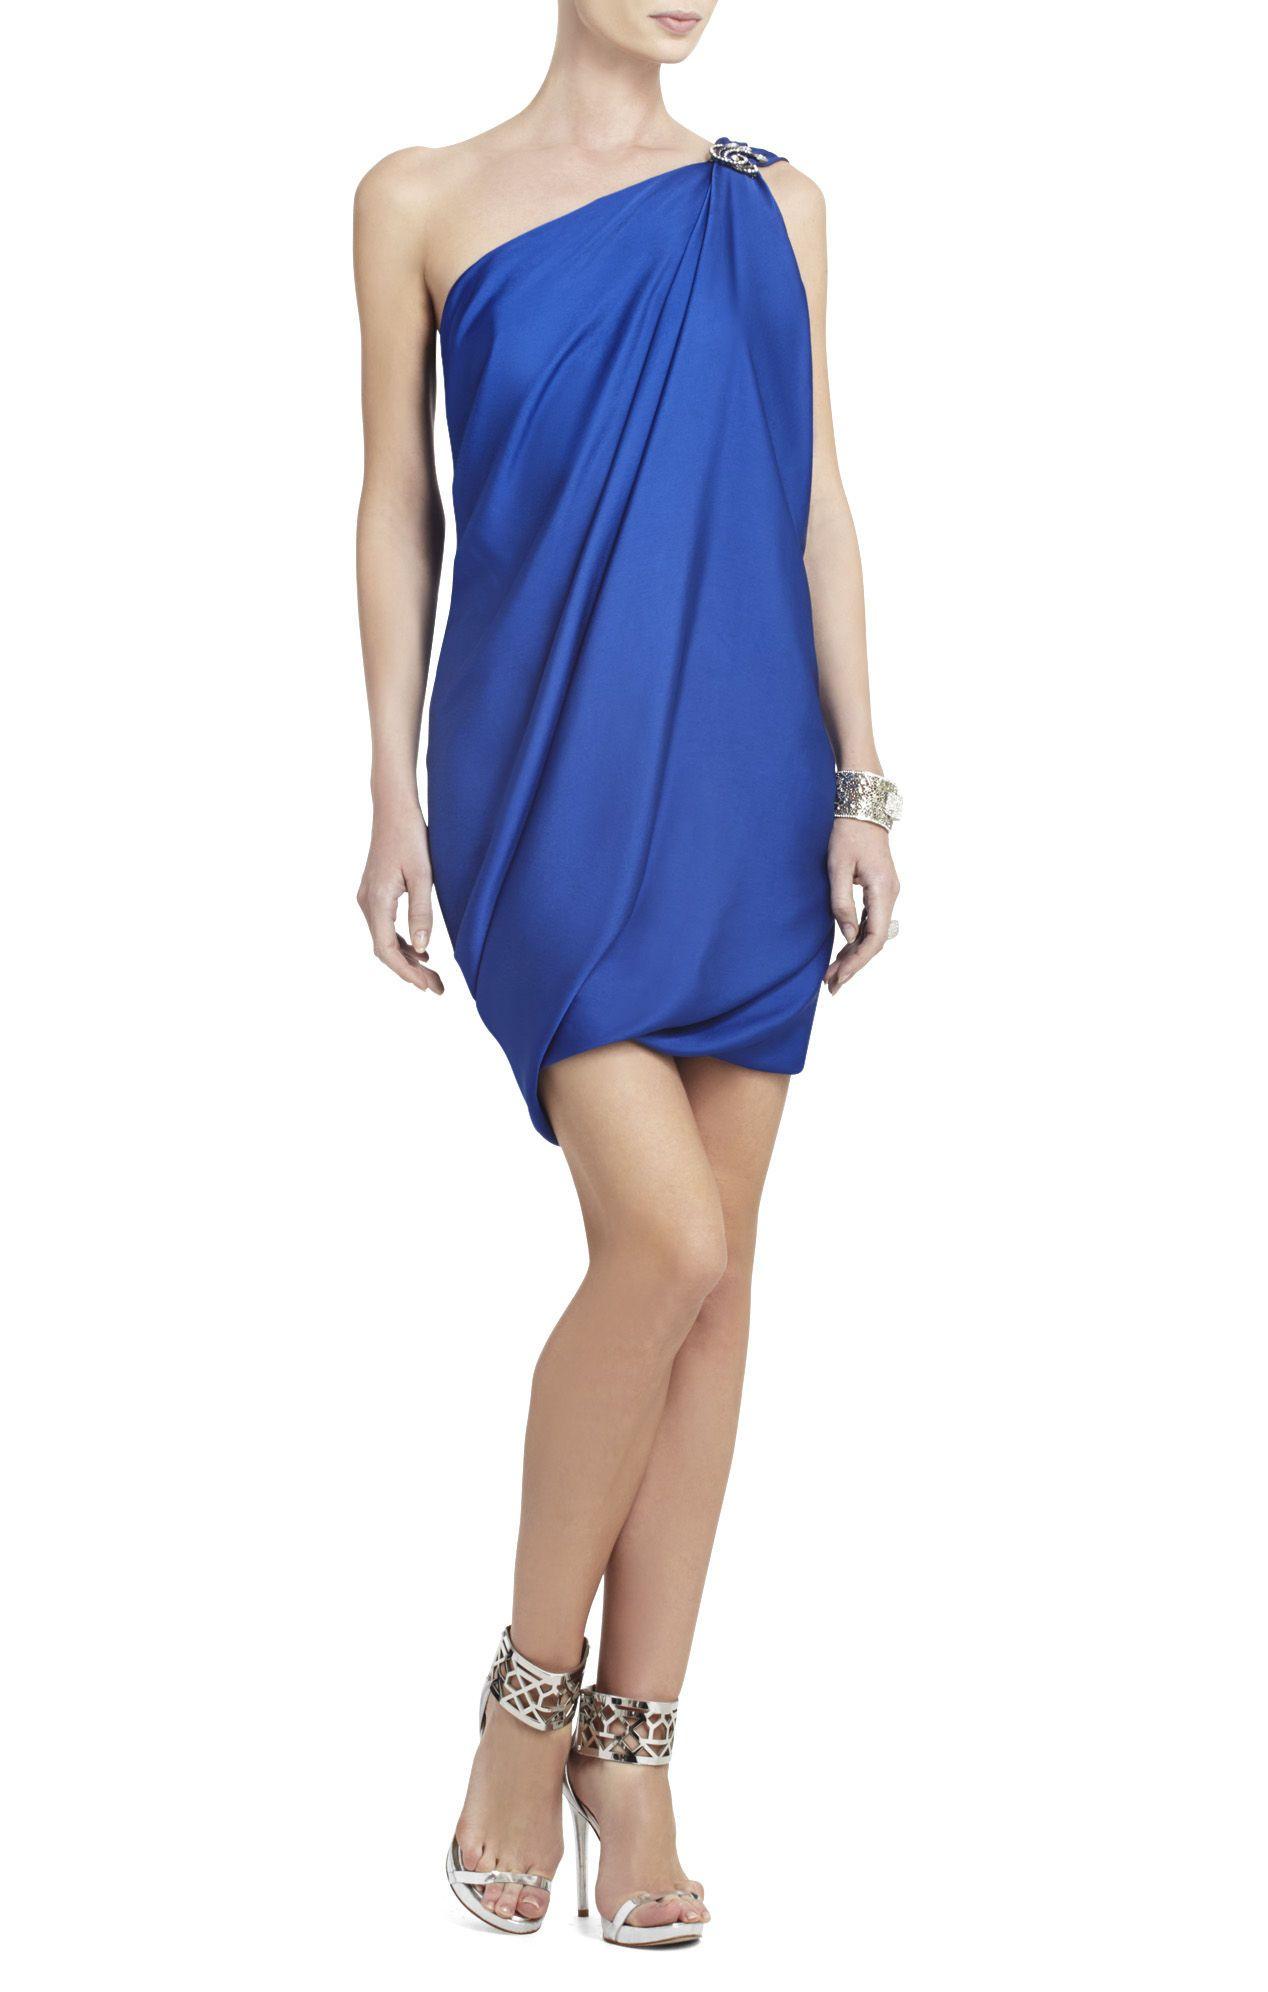 Draped Soirée Dress Shoulder De Robe Atla style Bcbg One 7PxHwH